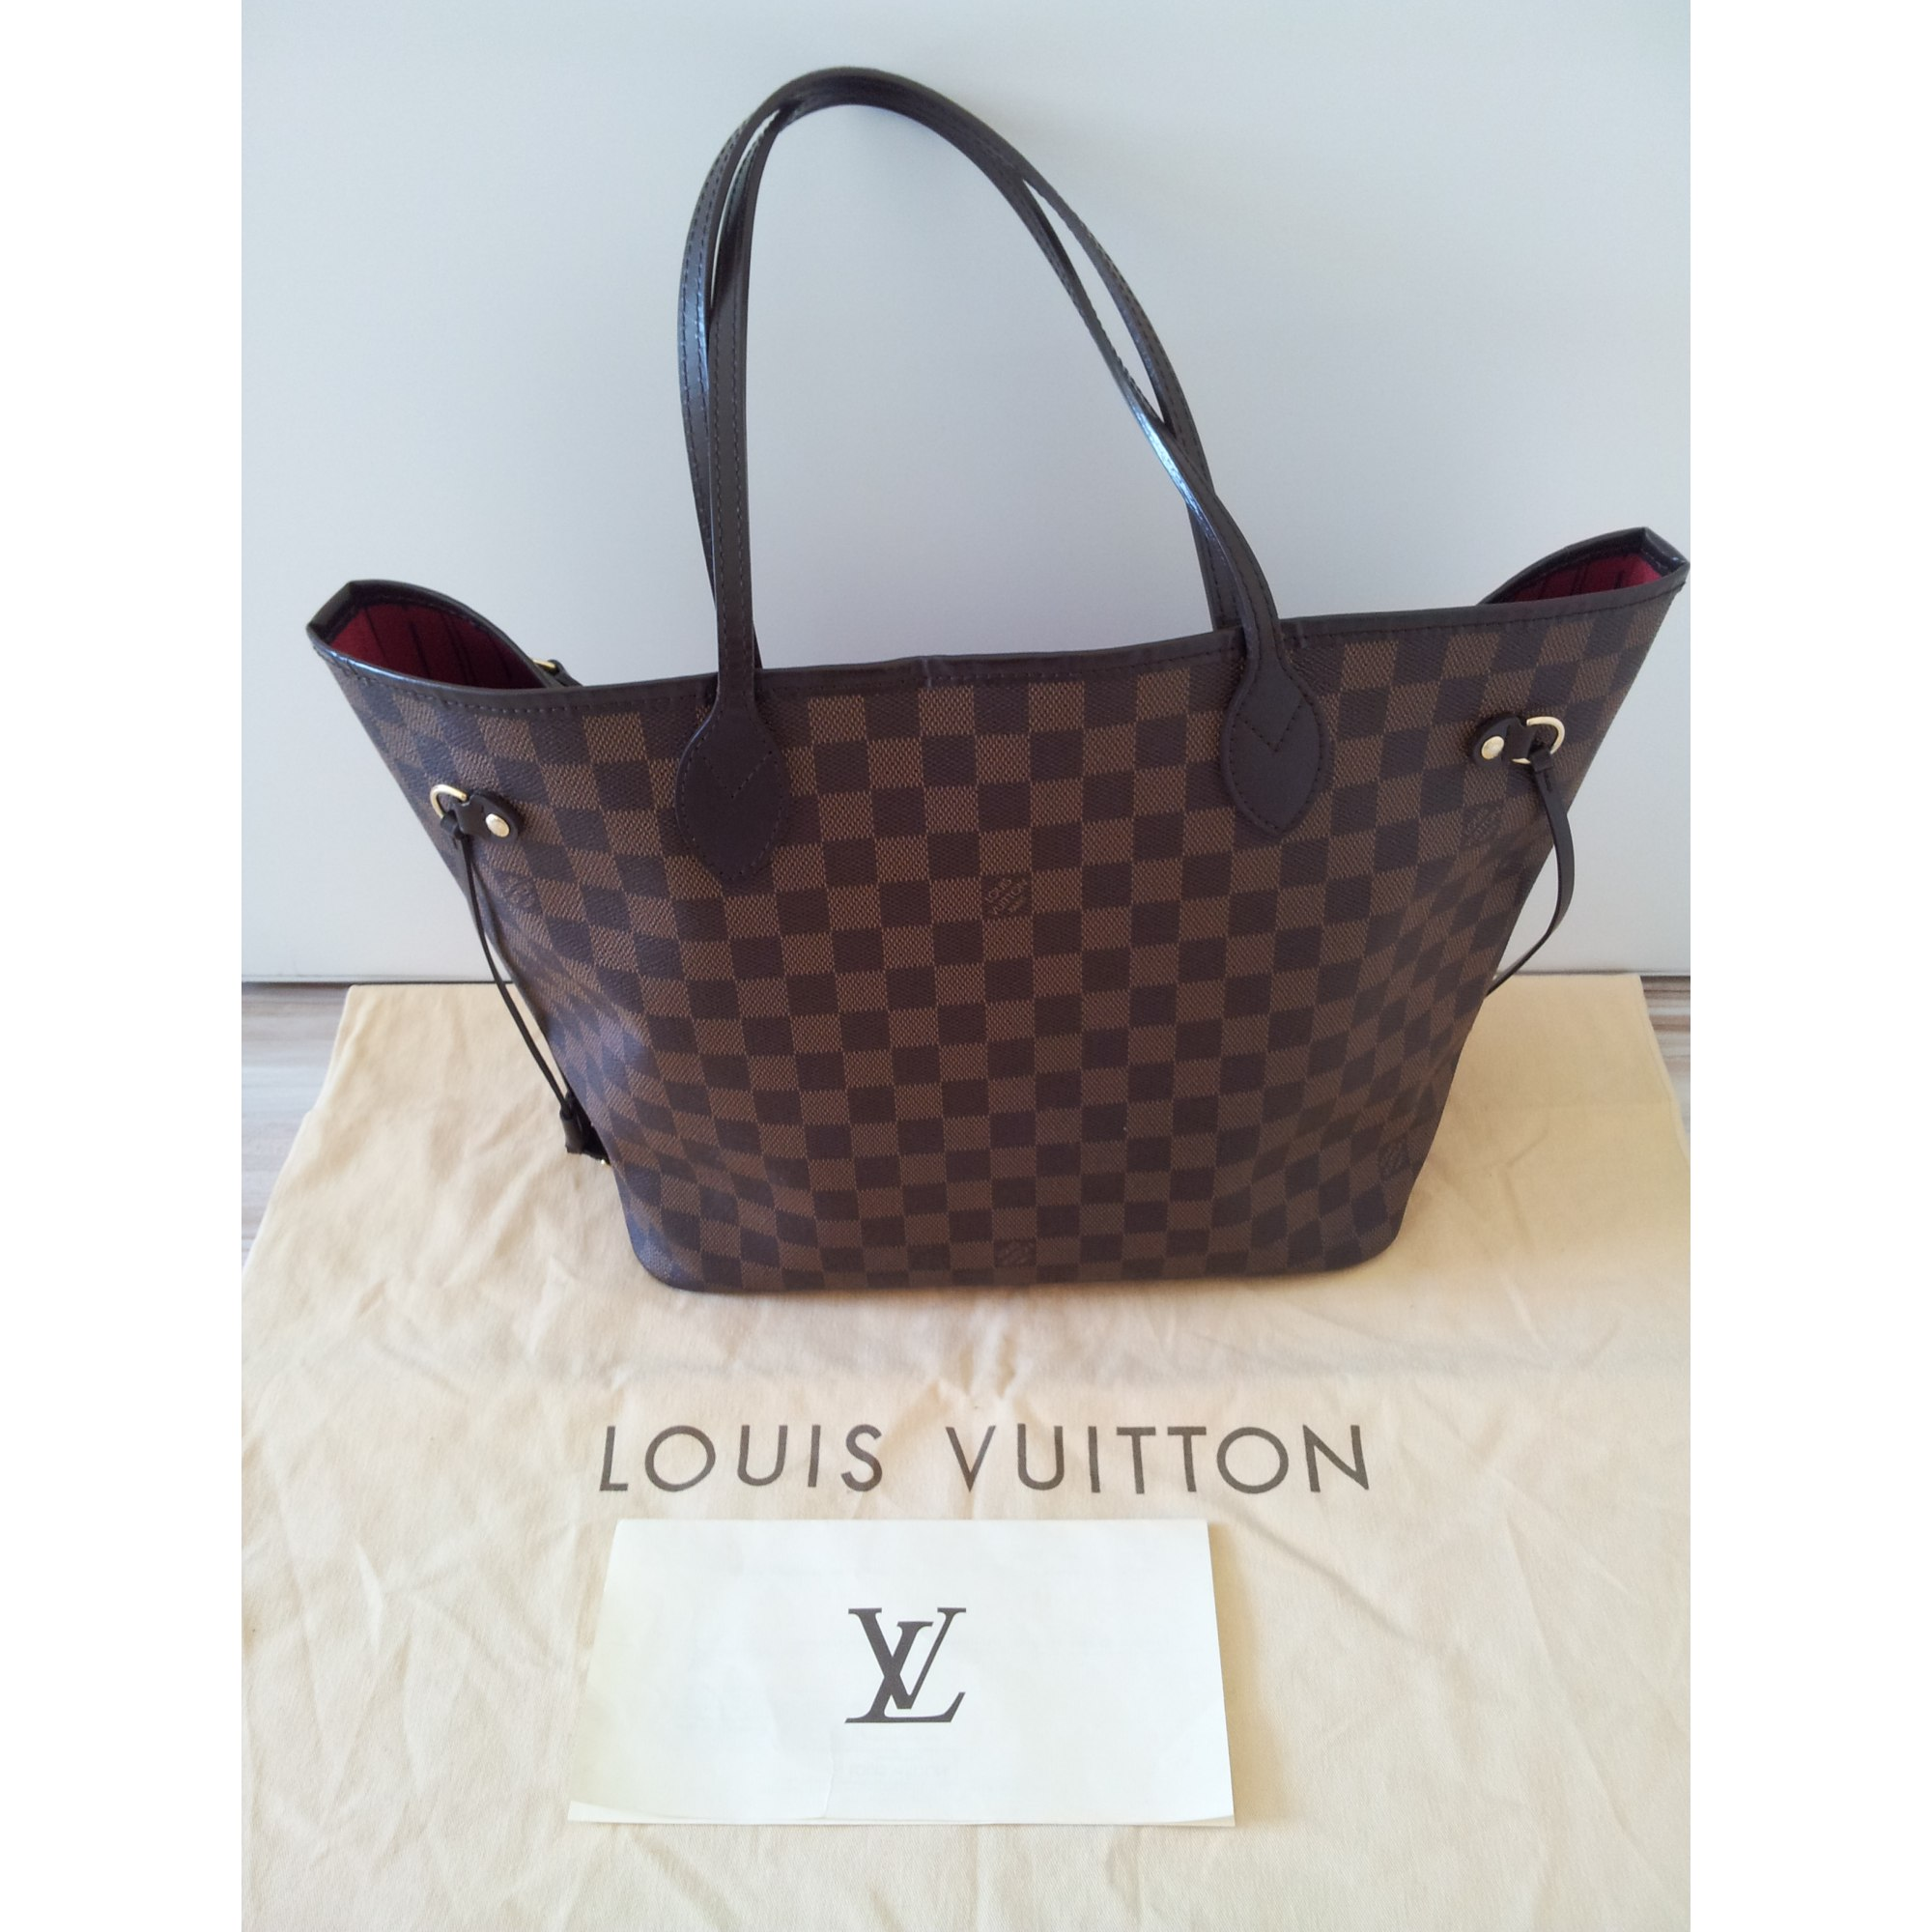 Sac à main en cuir LOUIS VUITTON marron vendu par Shopname296380 ... 4f2b356647b